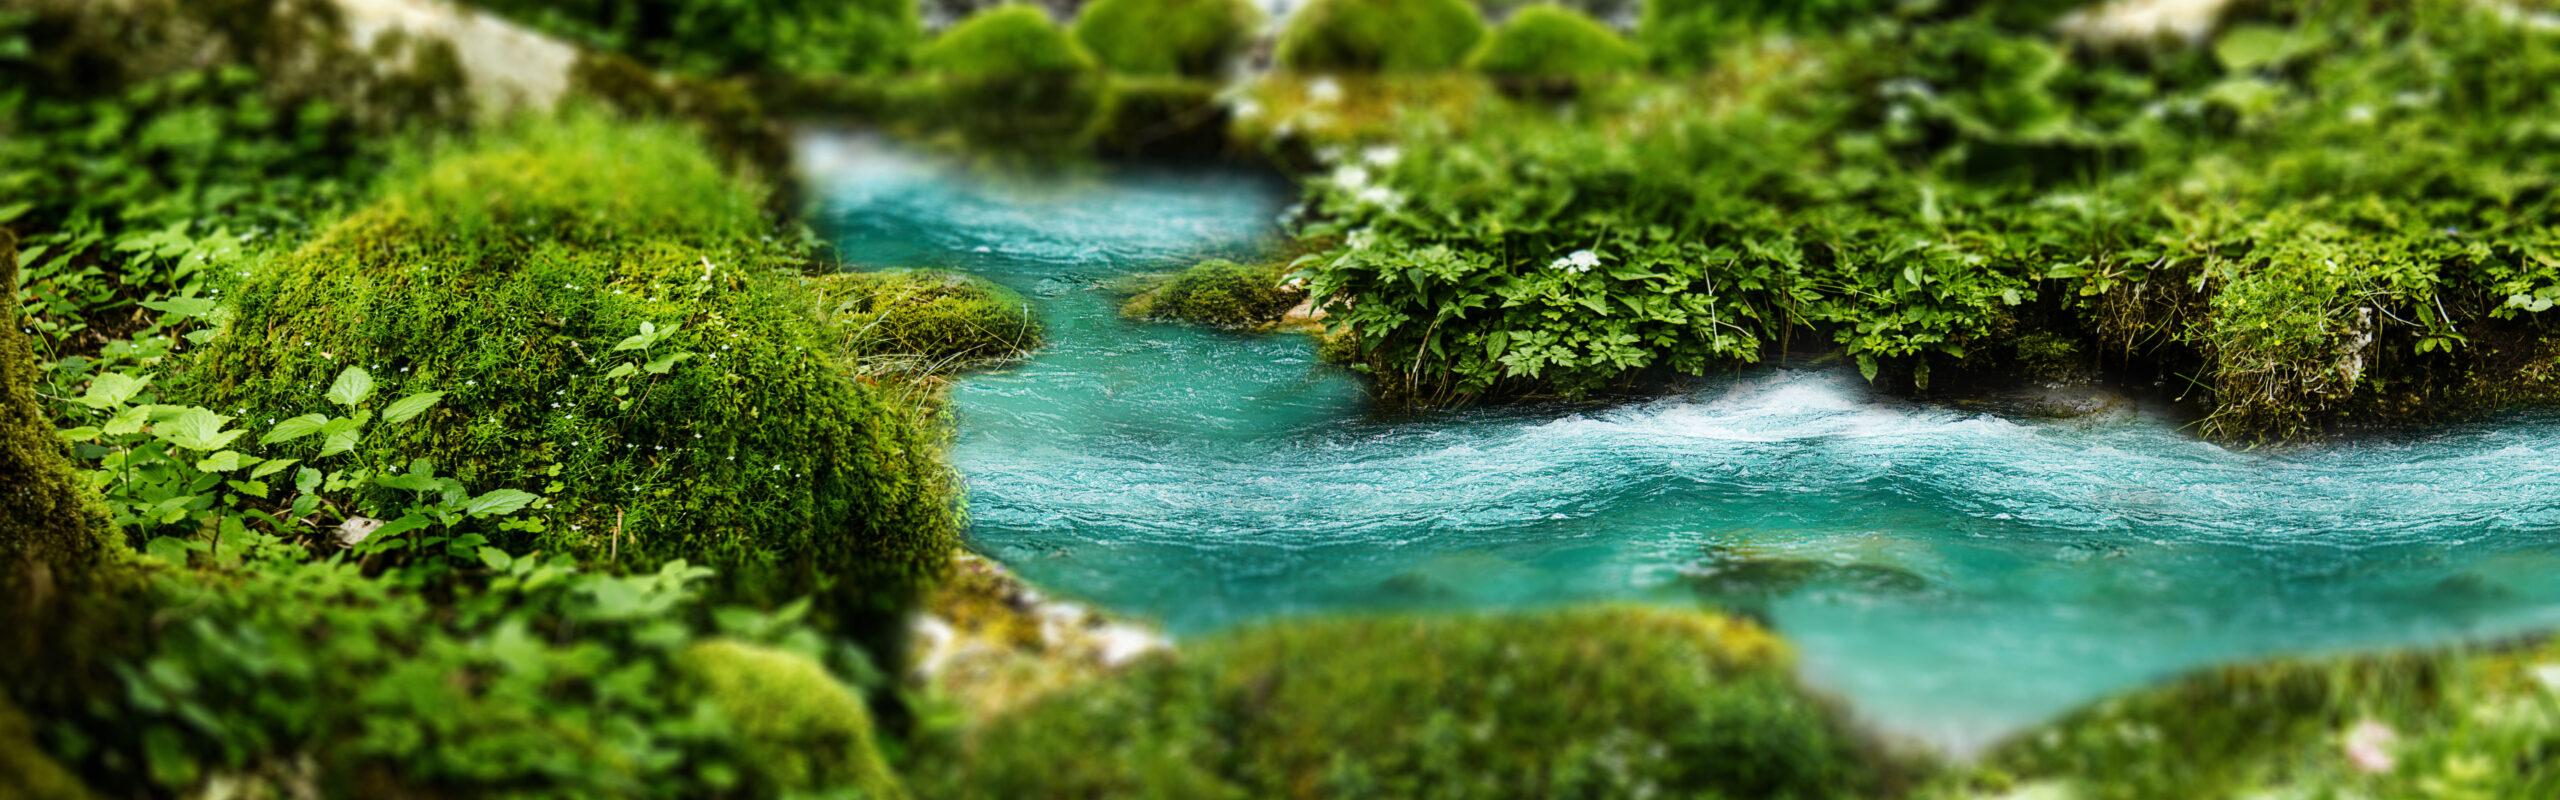 A blue river flows through a bed of green moss